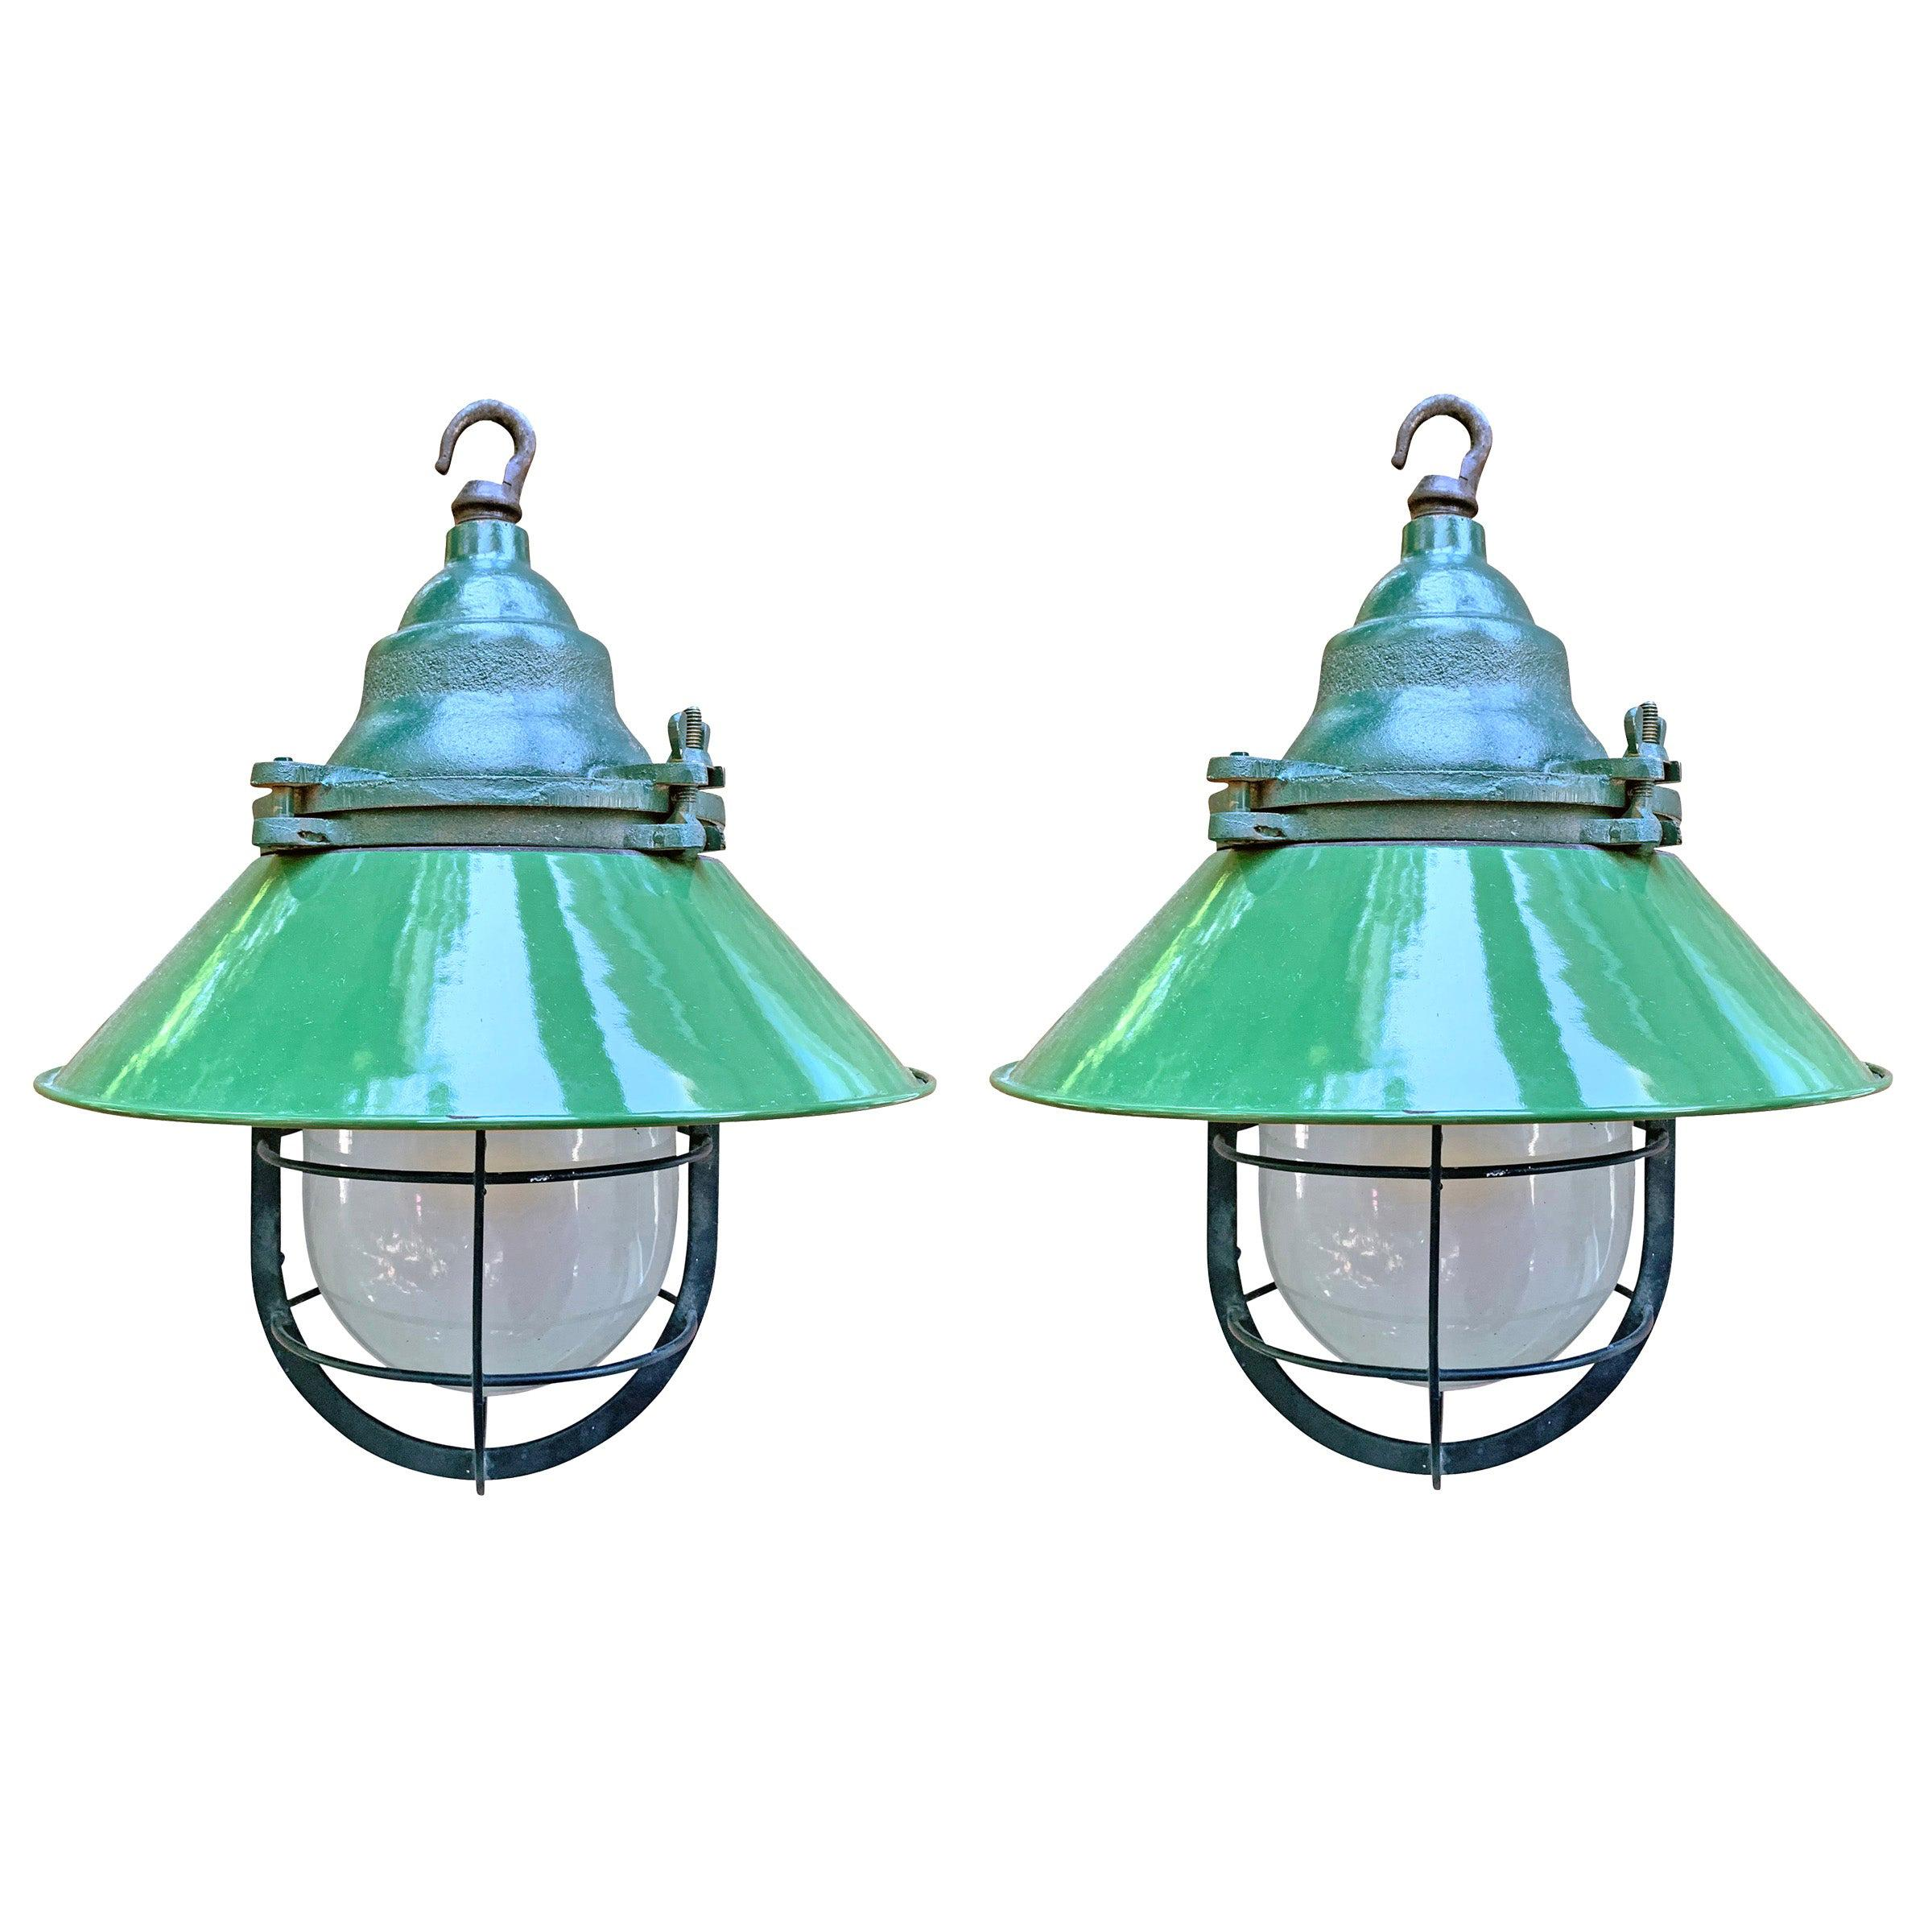 Pair of American Industrial Enamel Pendant Light Fixtures